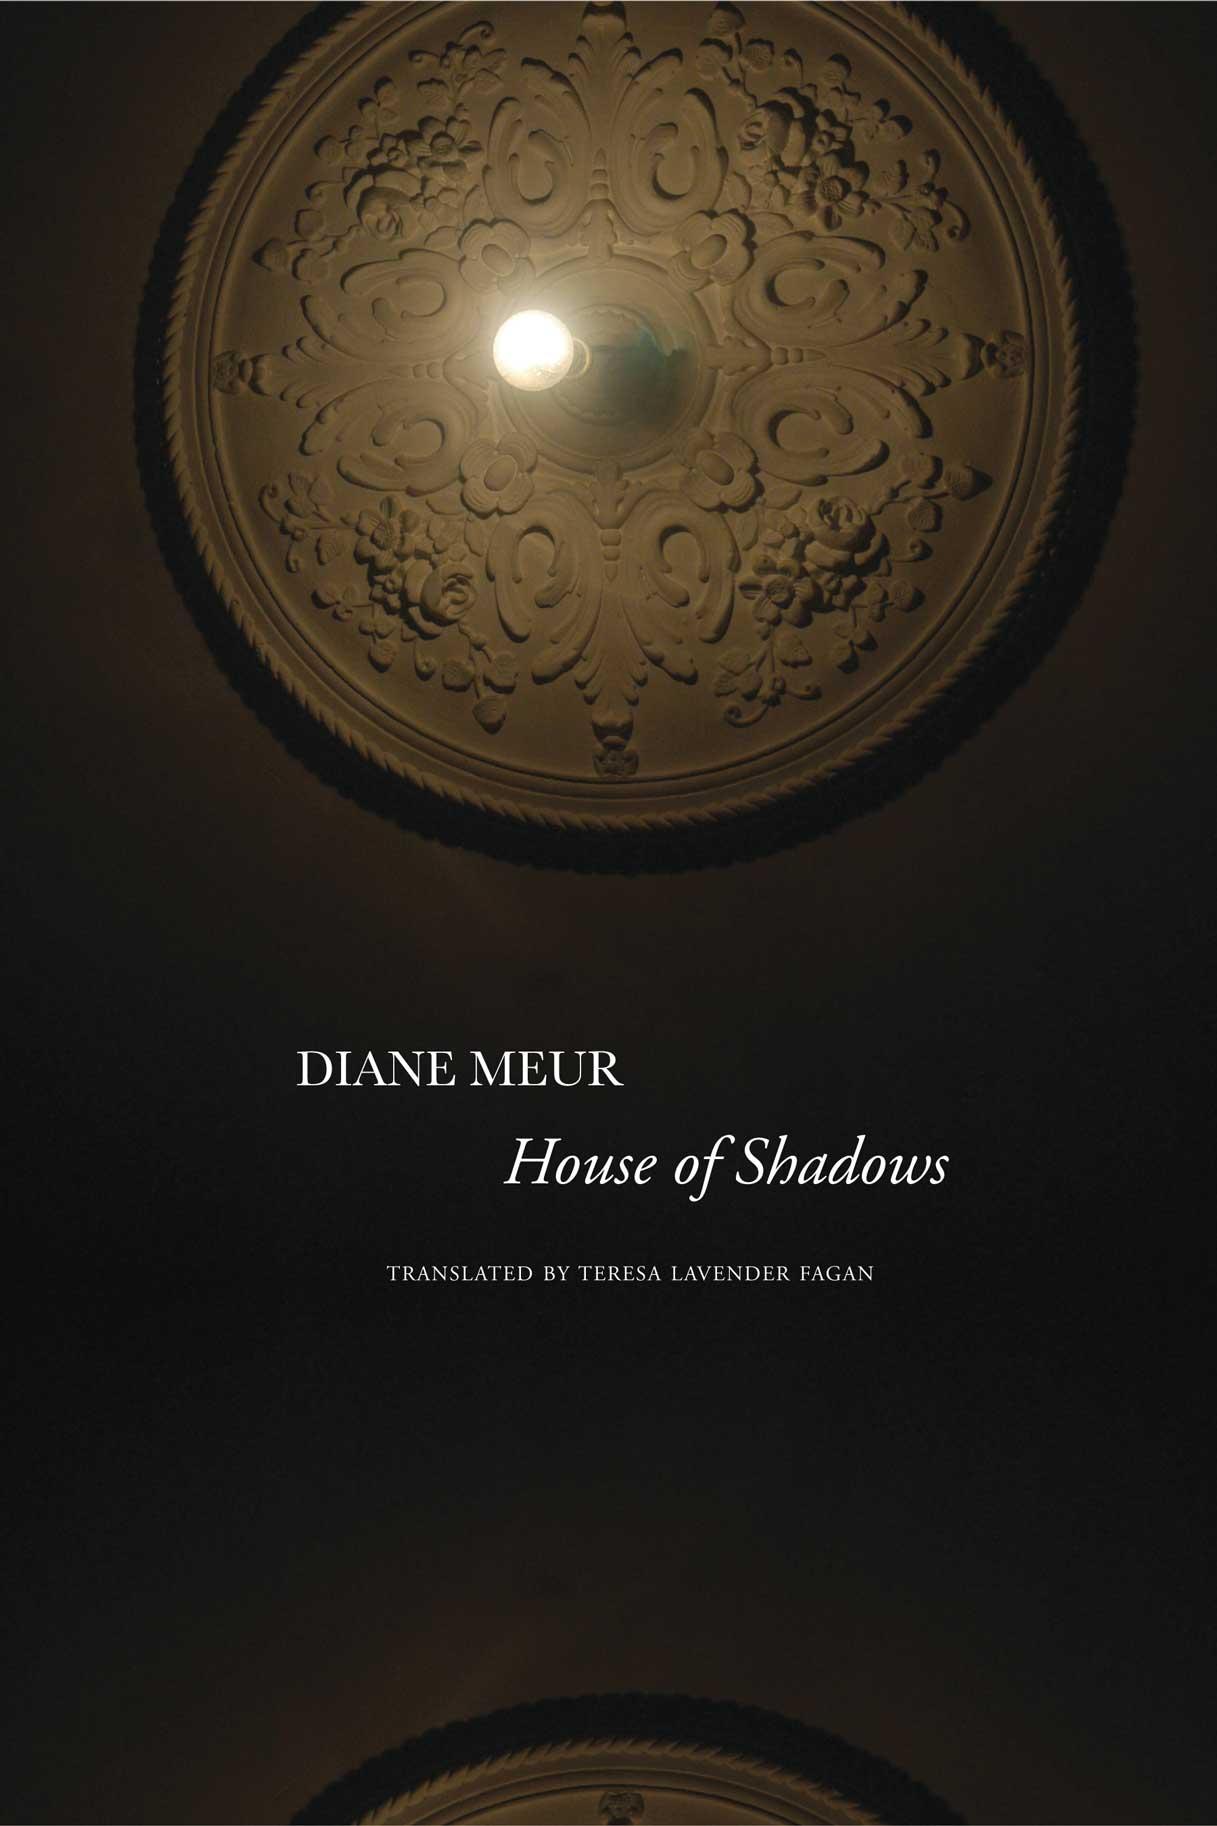 House of Shadows by Diane Meur |  Seagull Books